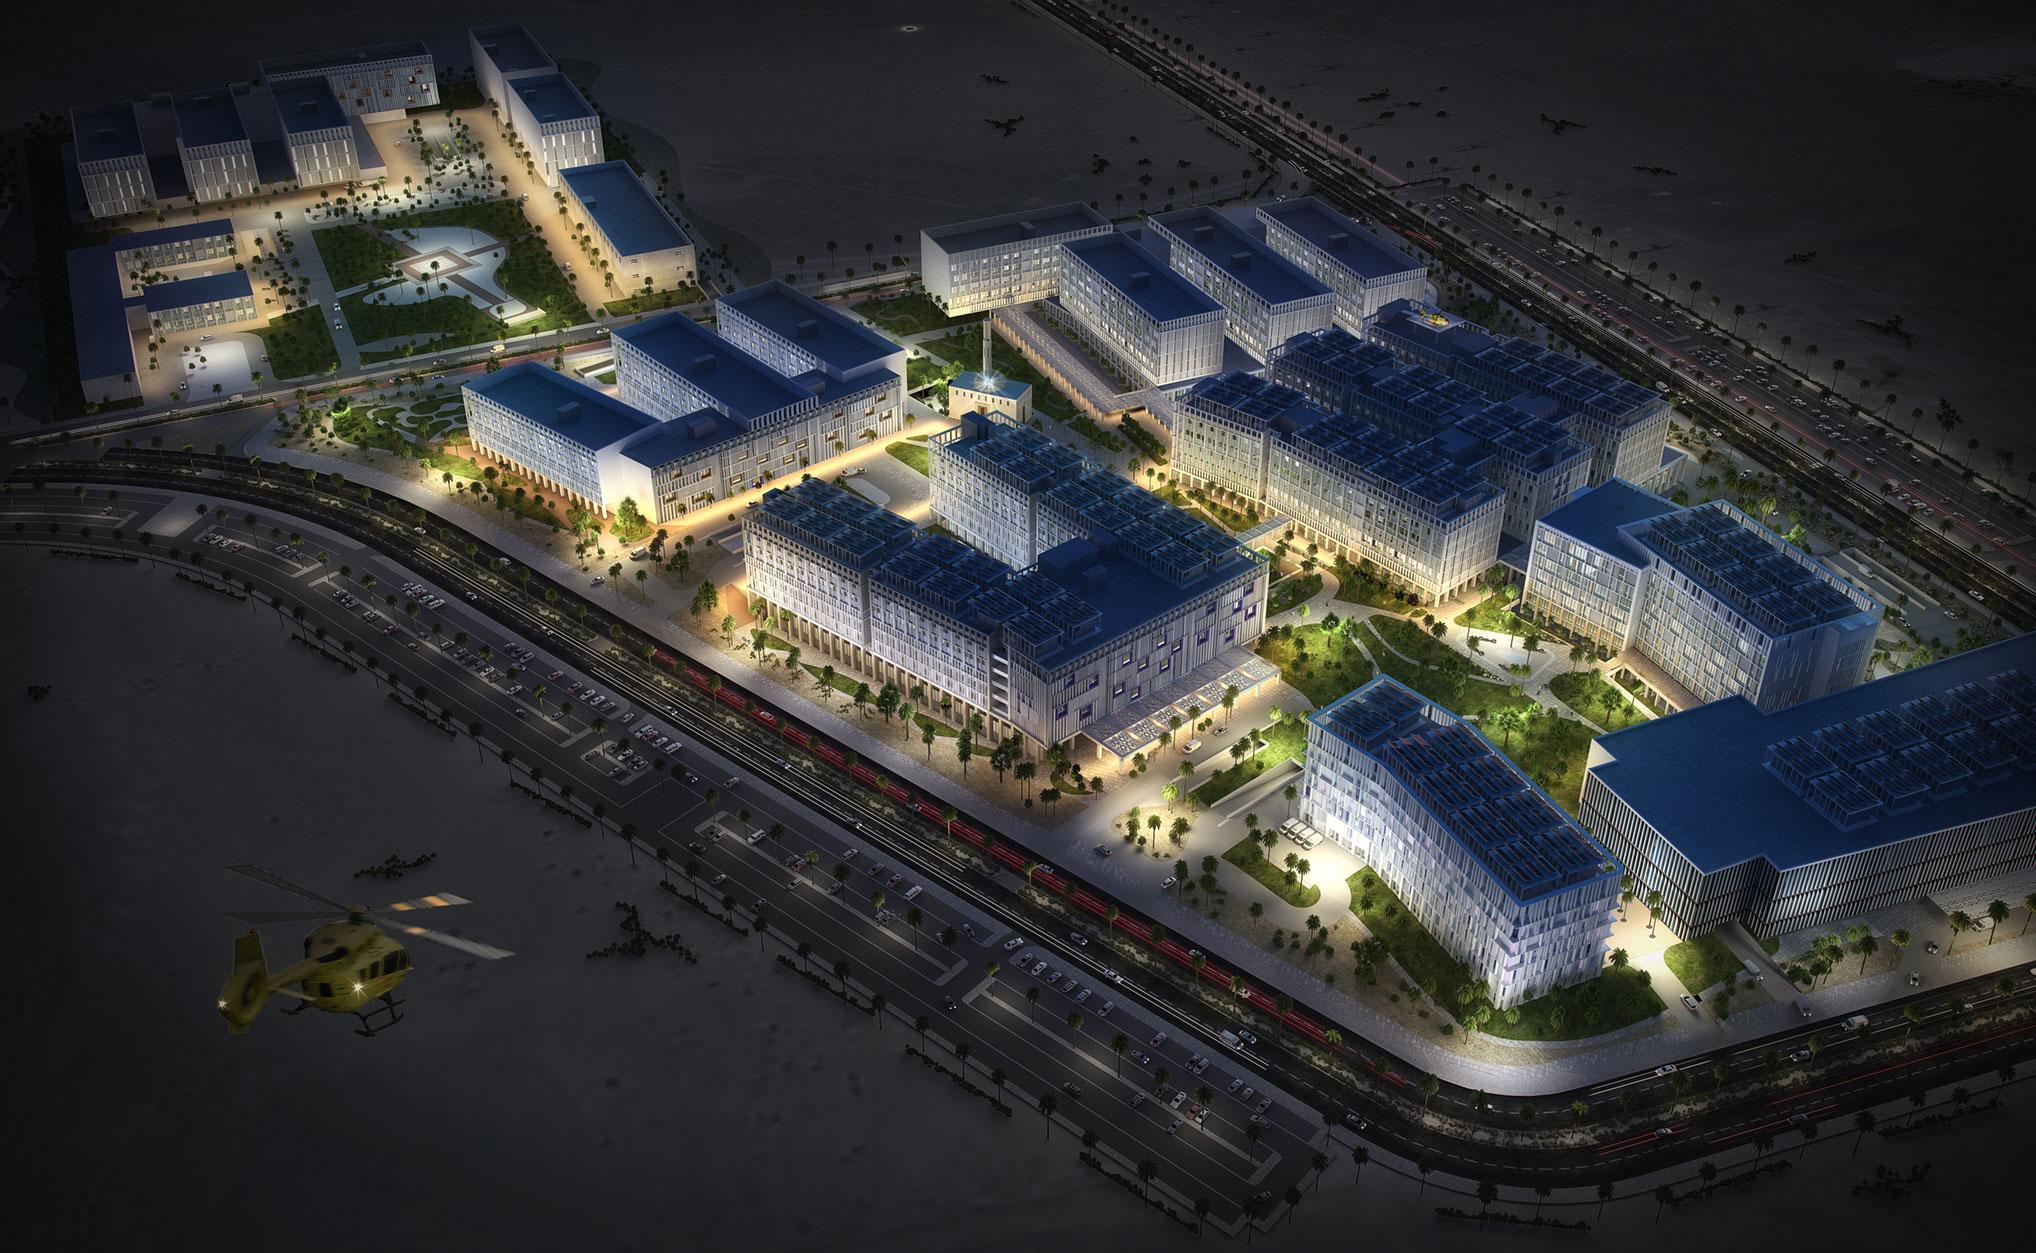 CapitalMED Medical City